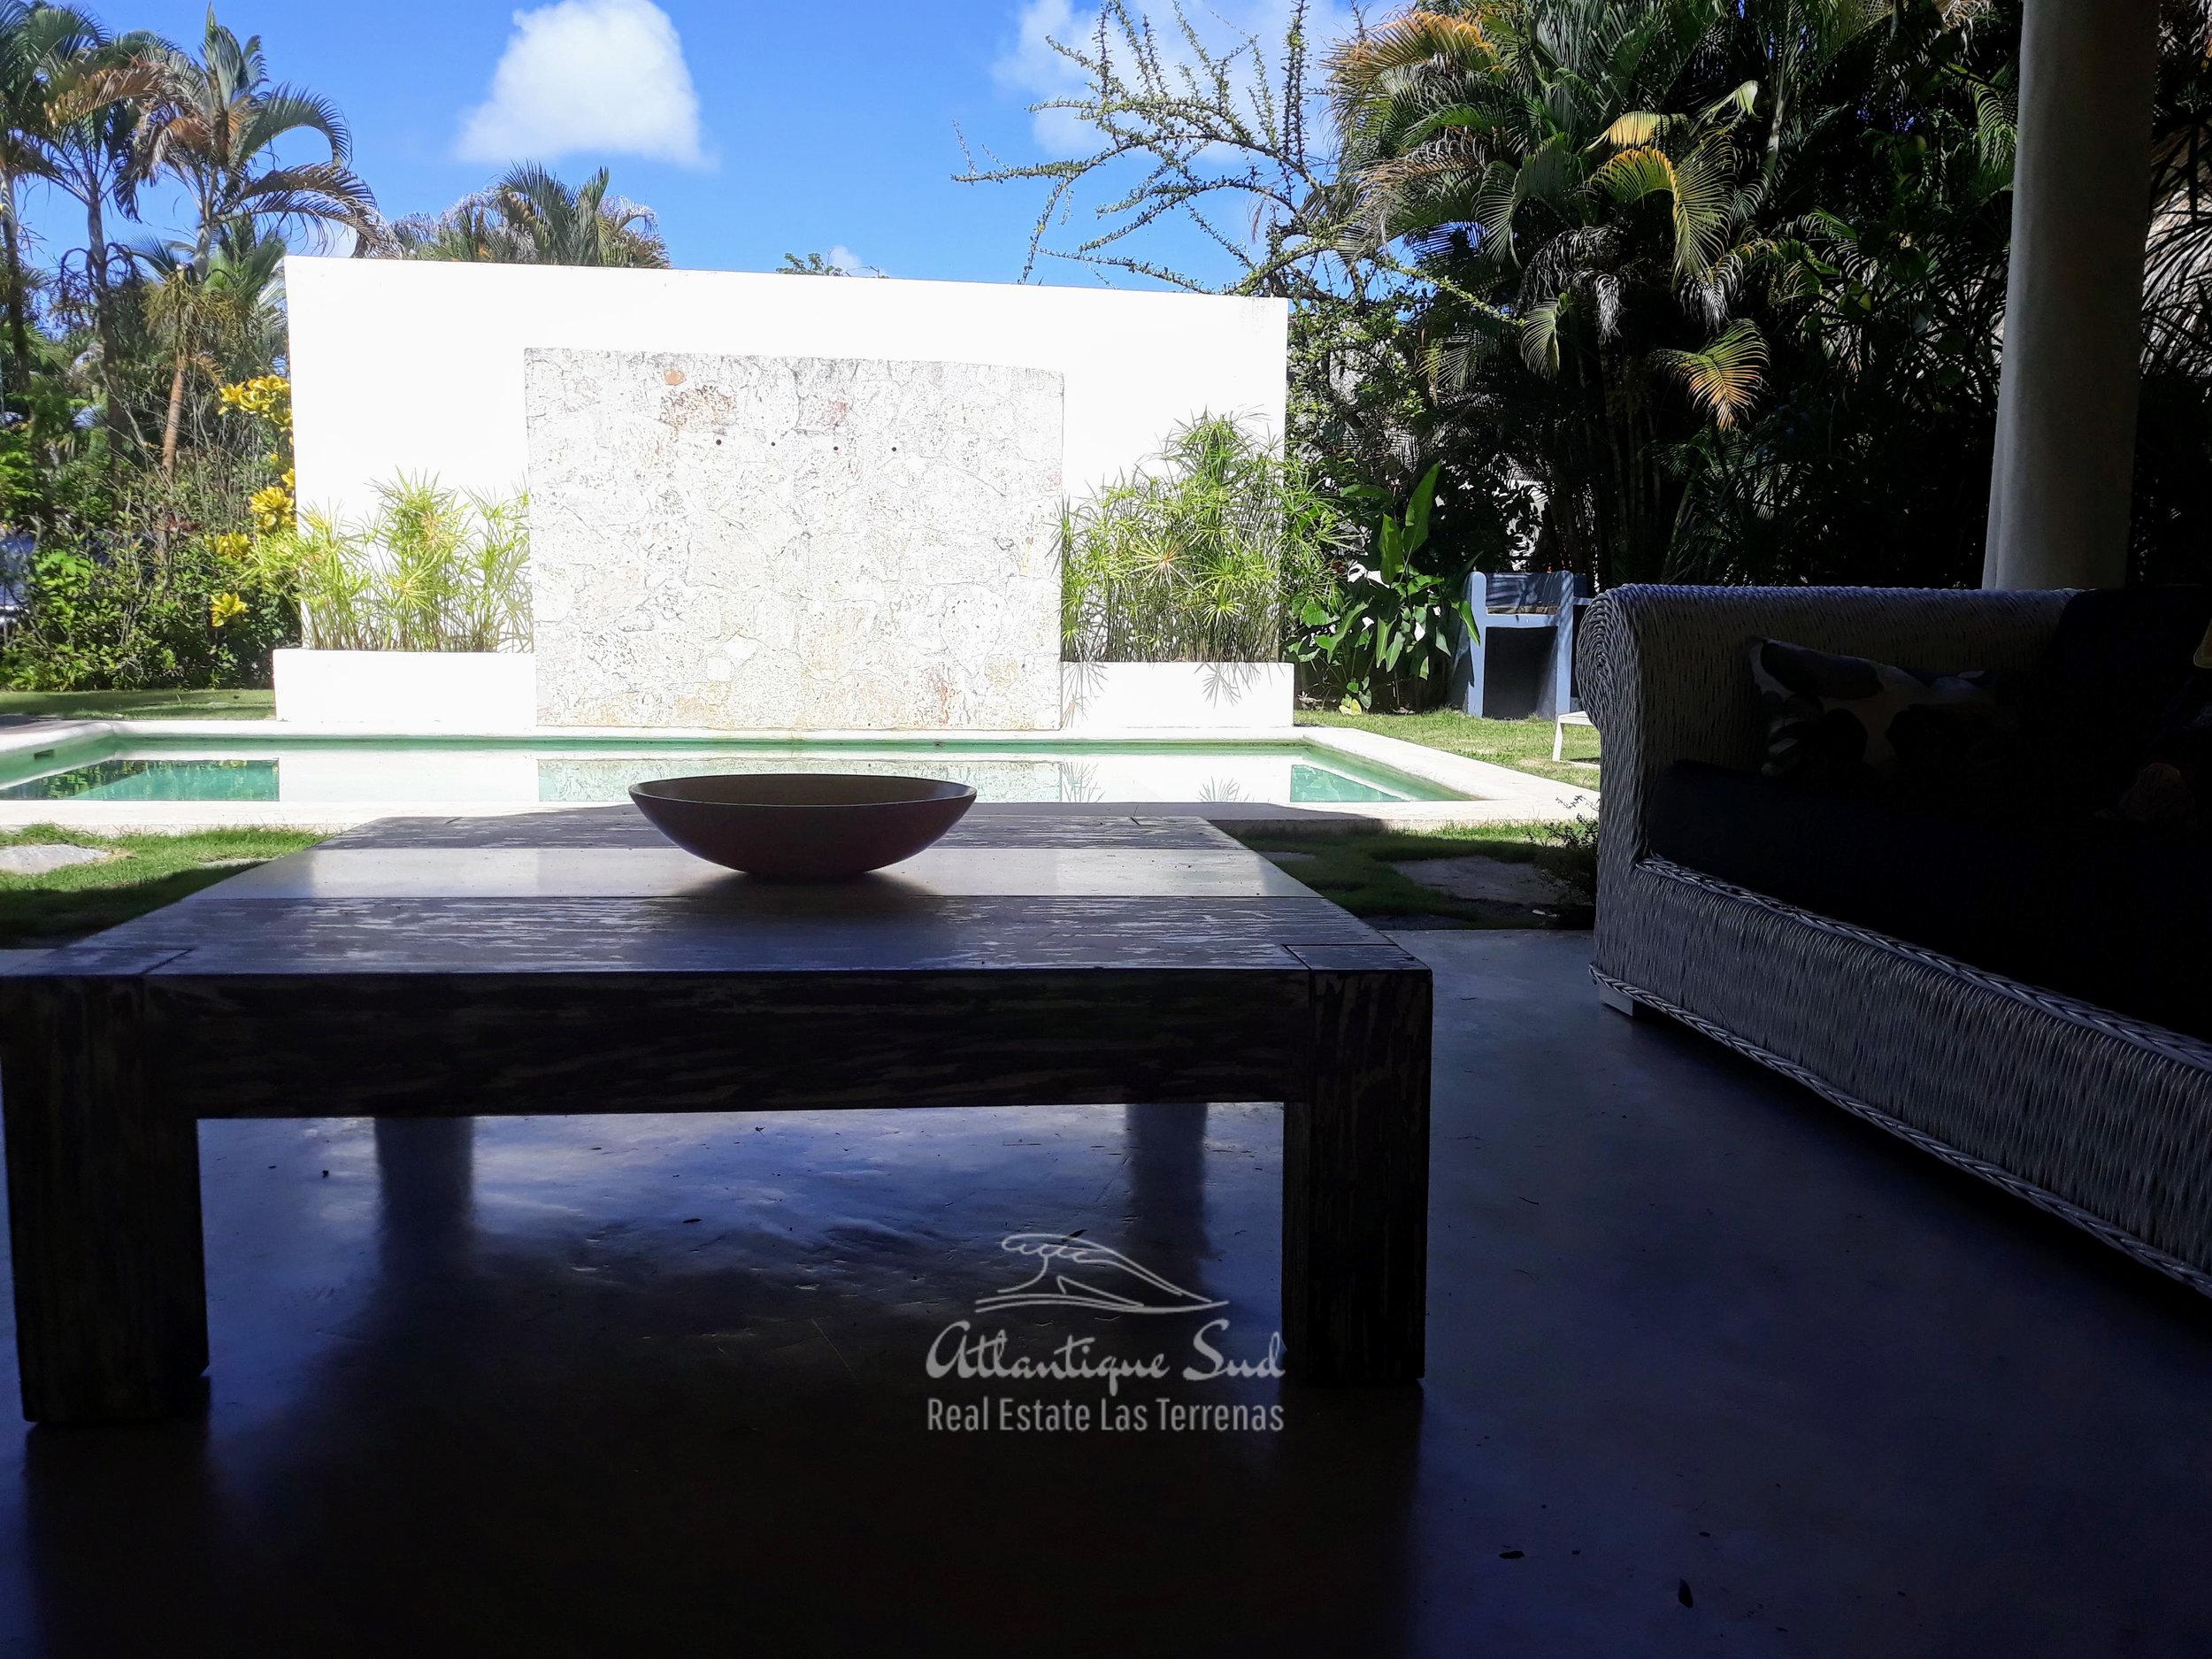 Authentic Caribbean Villa in quiet community in Real Estate Las Terrenas Atlantique Sud6.jpg